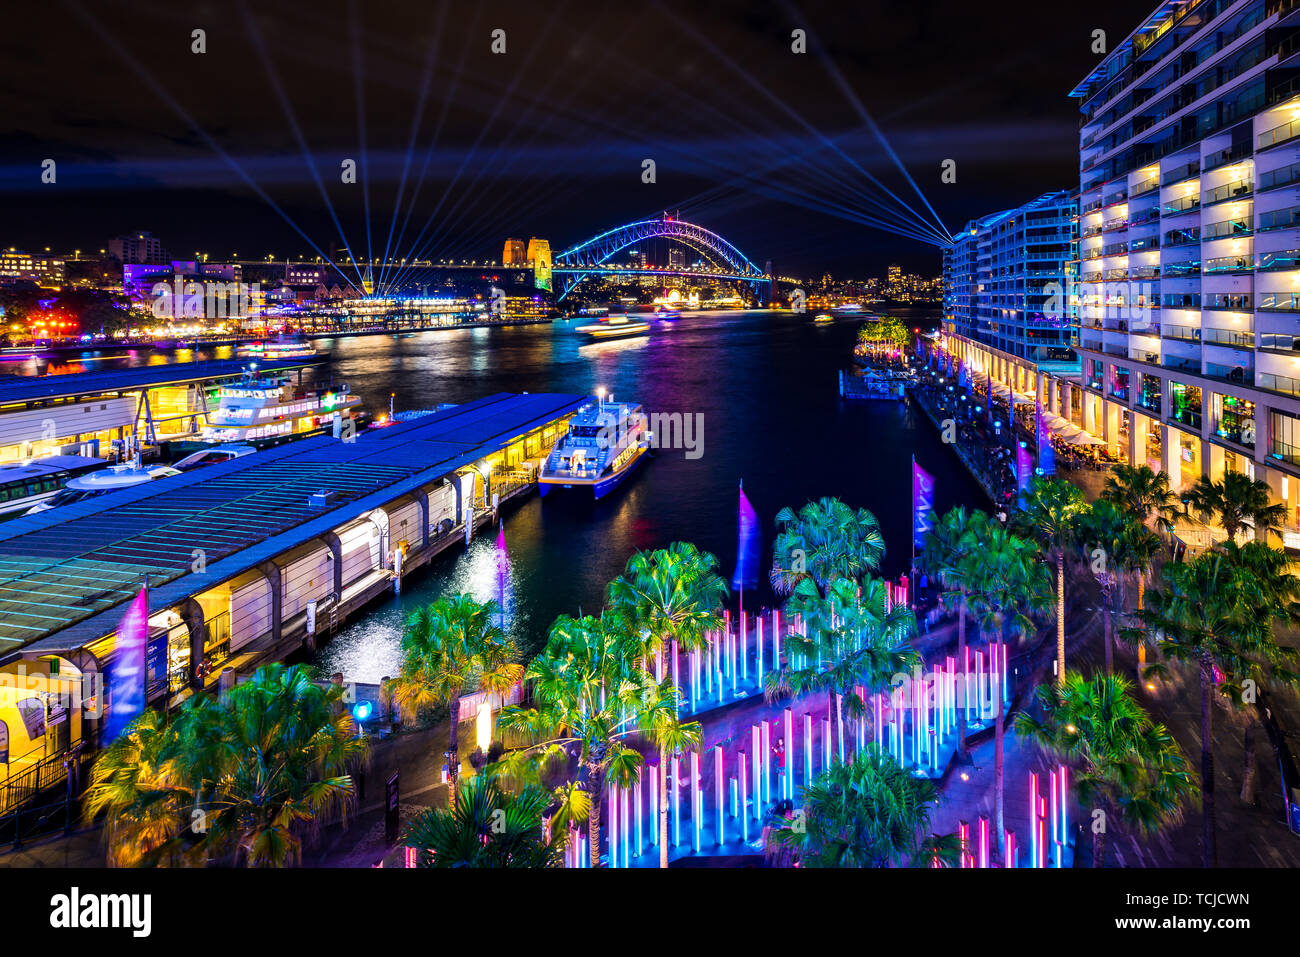 Sydney Harbour during Vivid, the annual light festival held in Sydney, Australia. Stock Photo